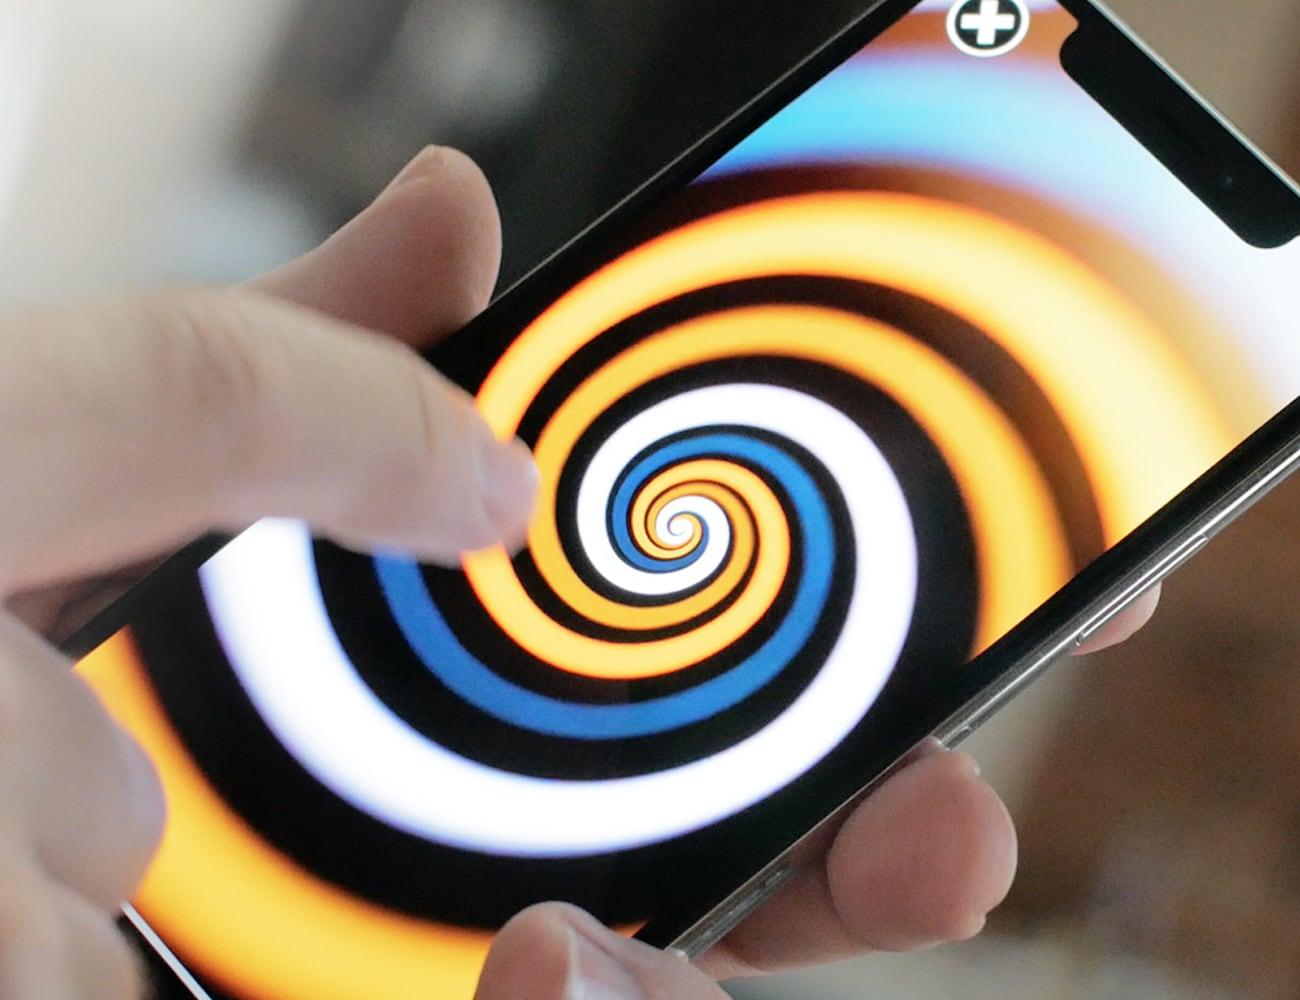 Fidj Phone Spinning Gadget